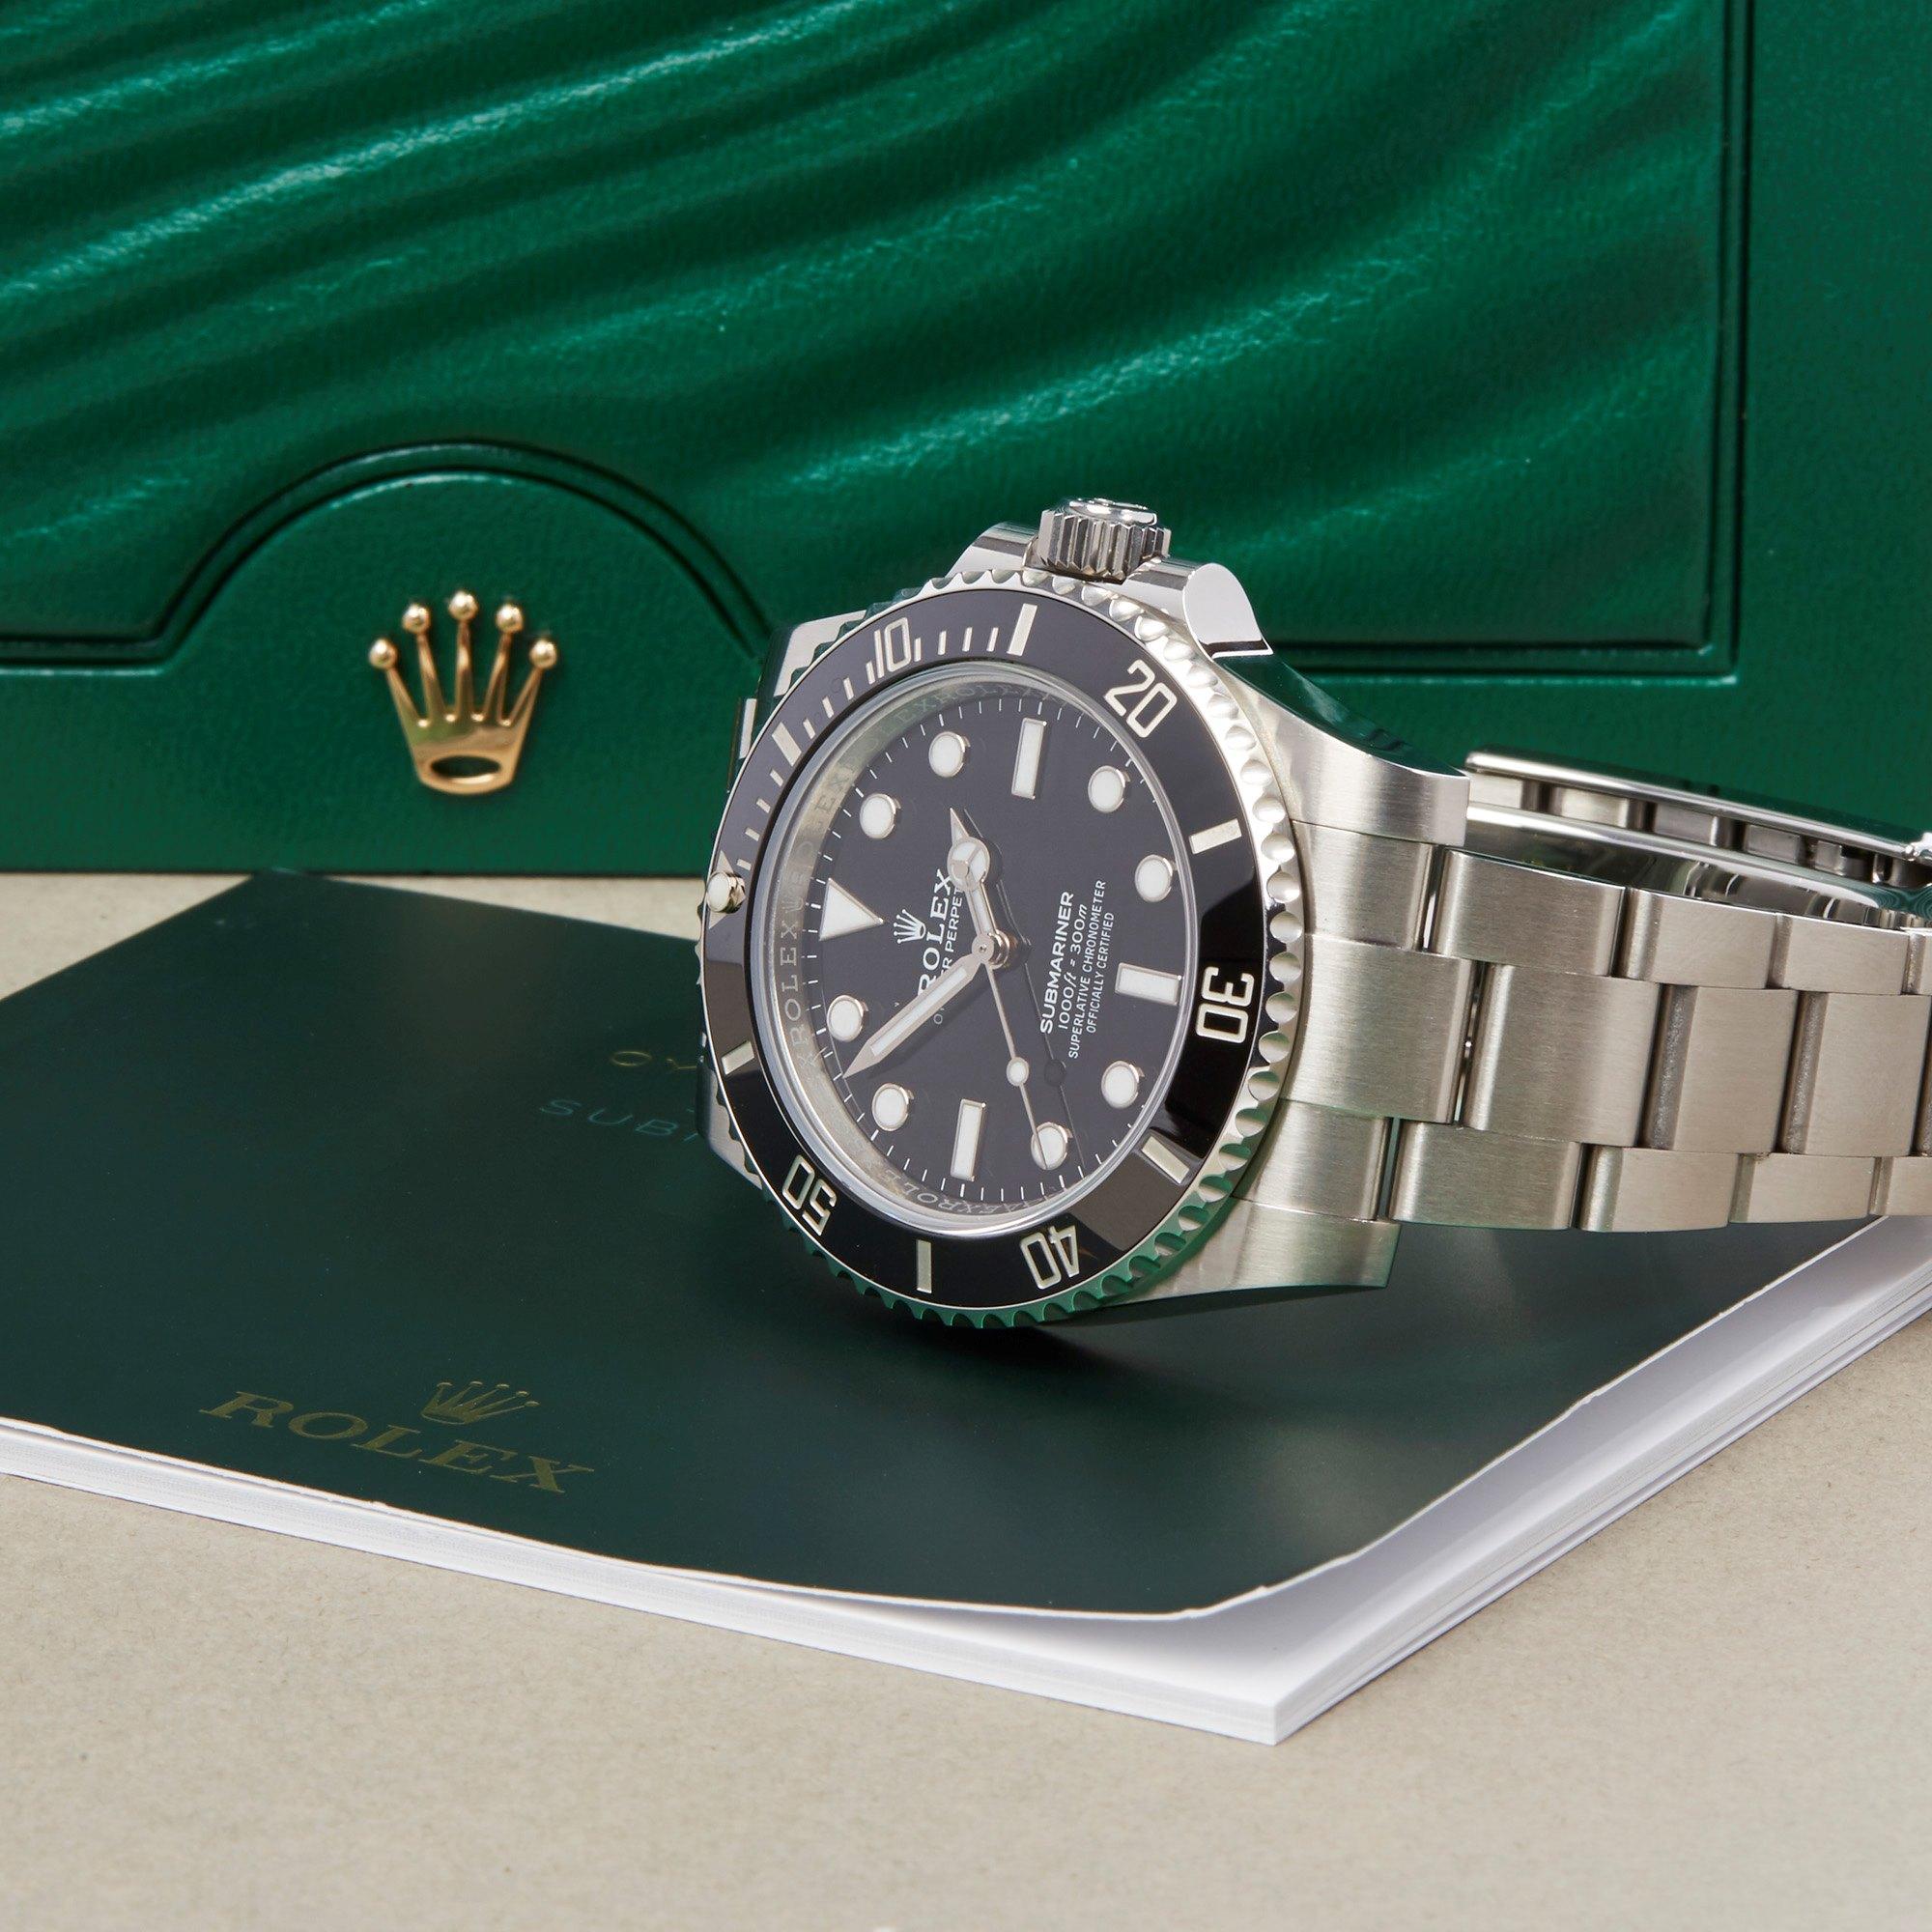 Rolex Submariner Non-Date Stainless Steel 114060